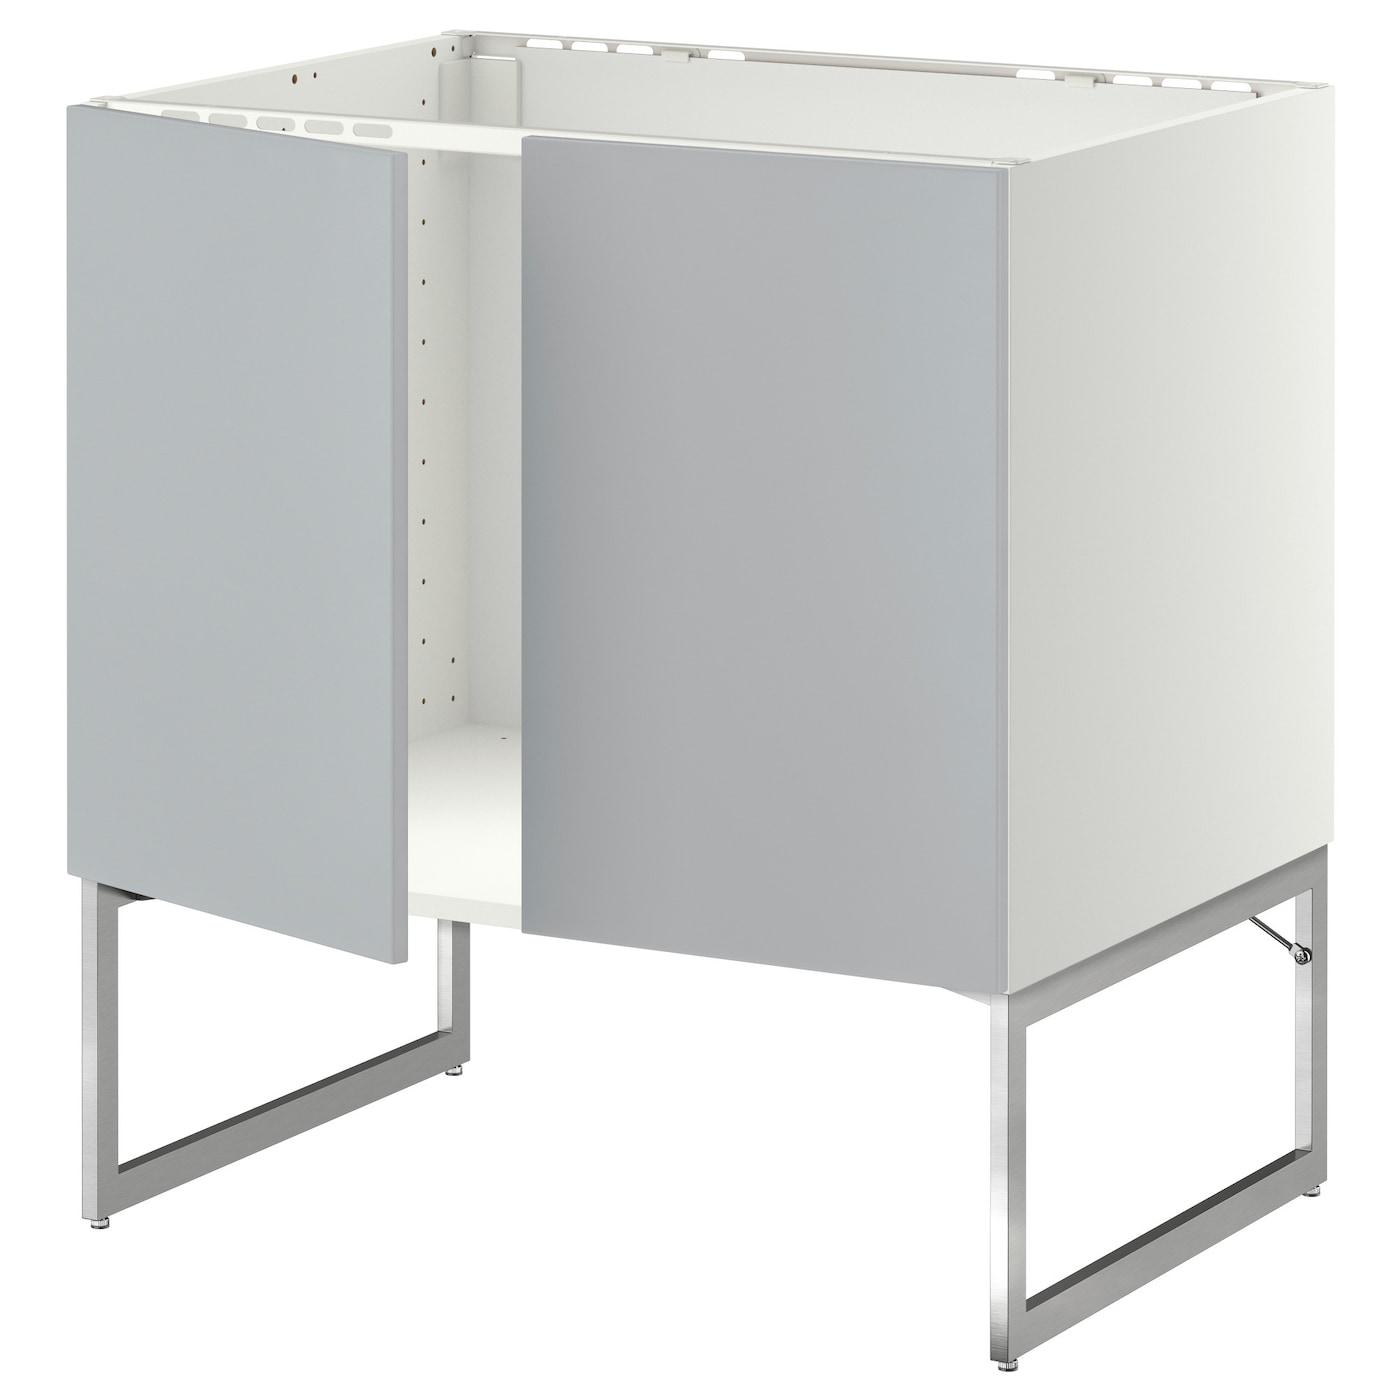 Metod base cabinet for sink 2 doors white veddinge grey for Ikea base cabinets